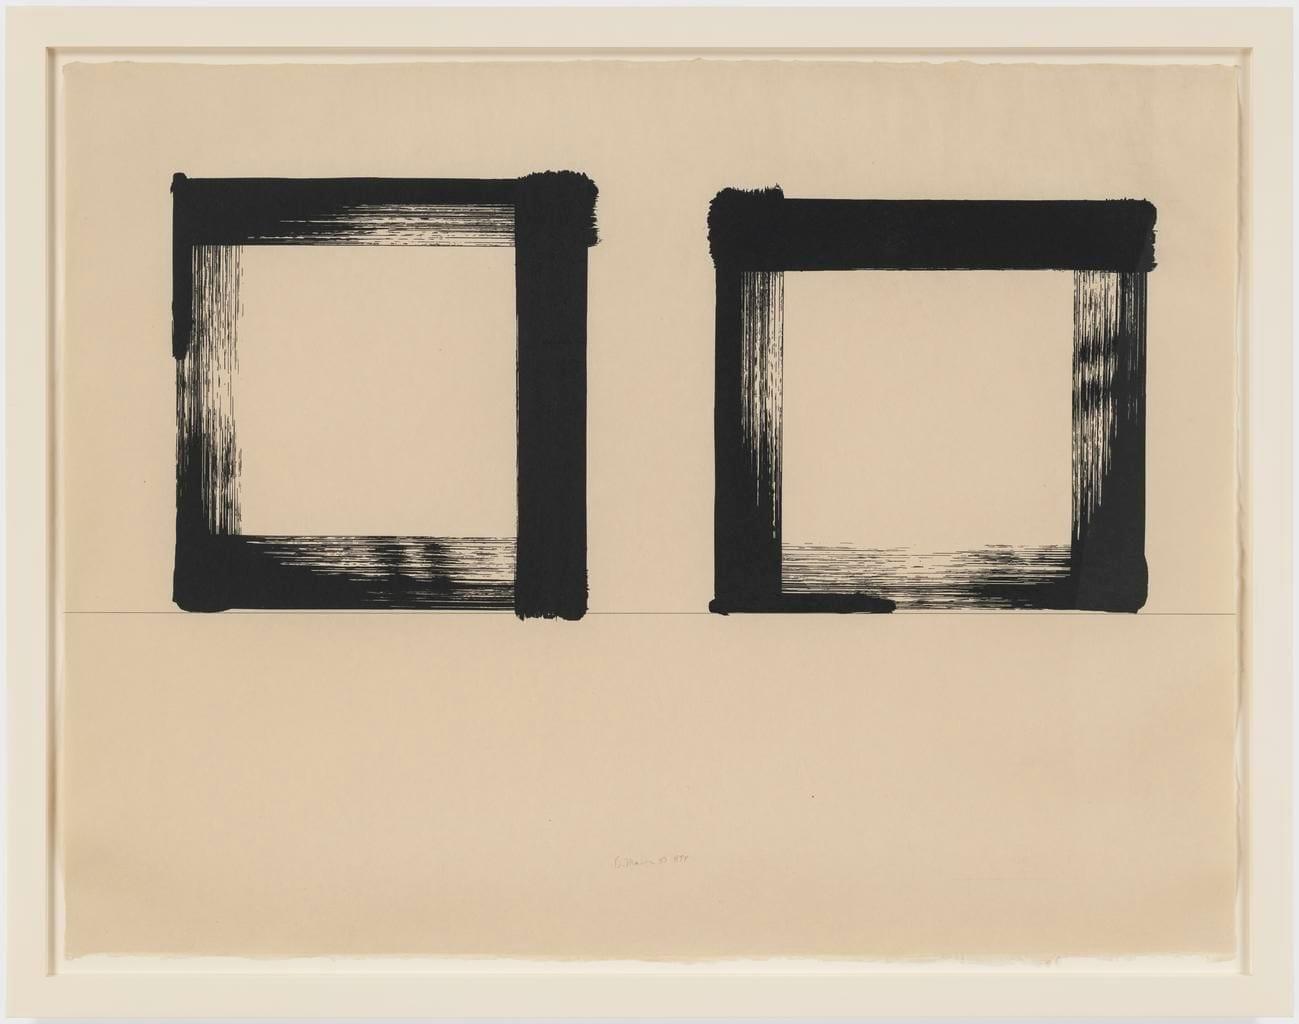 Untitled 1983 Medium: Screenprint on Japanese handmade paper